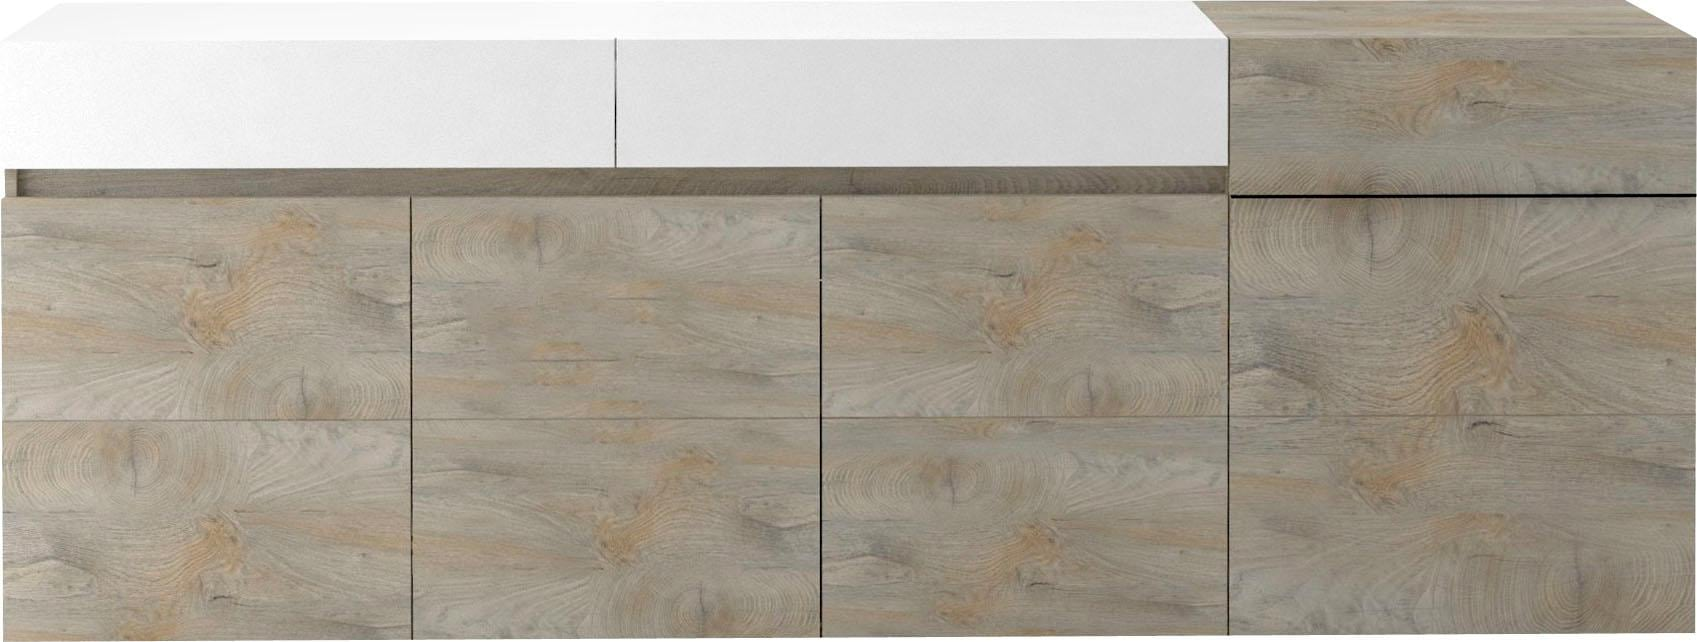 SCIAE Sideboard Brio Breite 240 cm